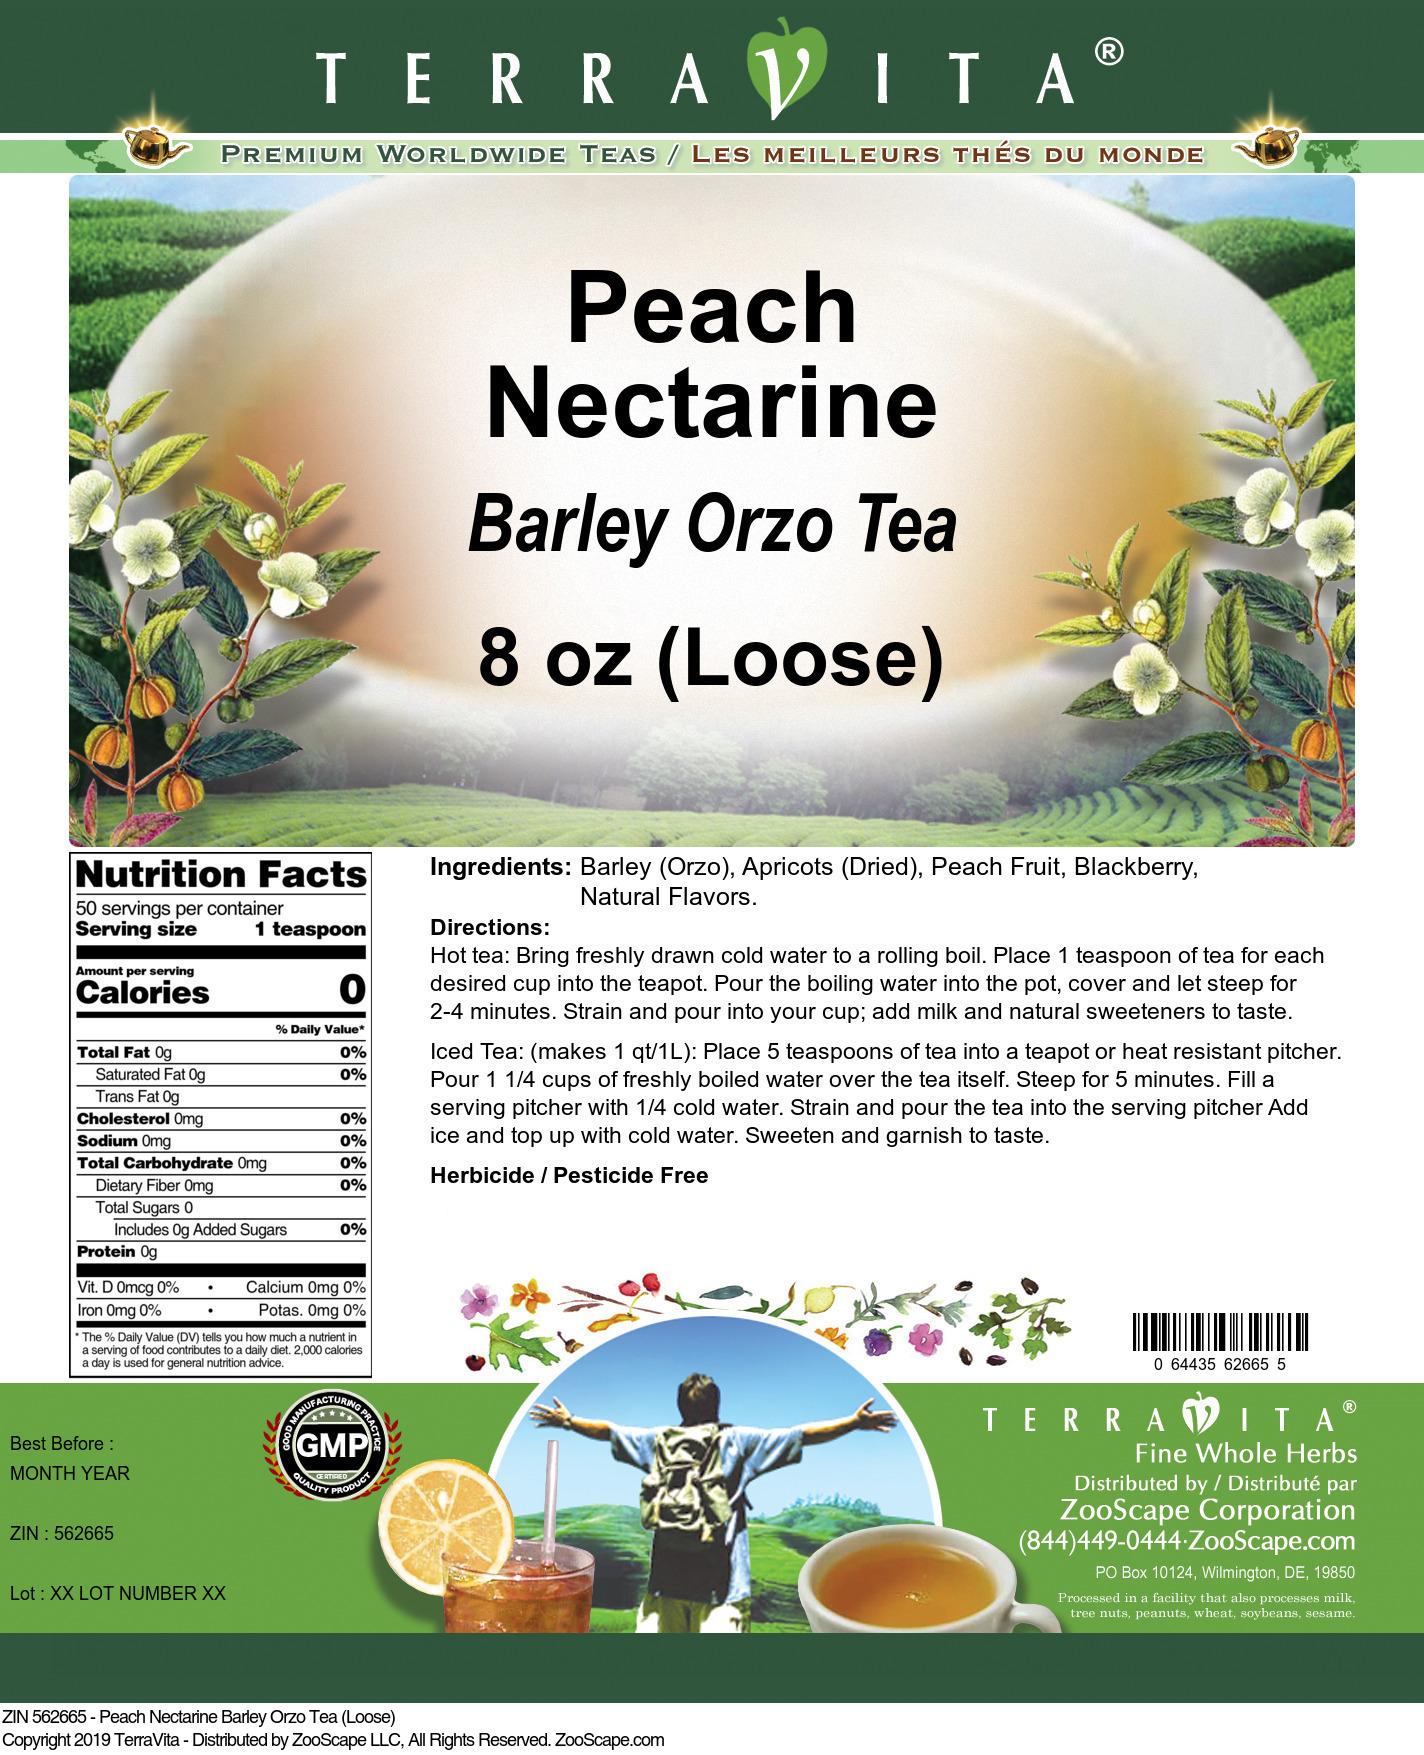 Peach Nectarine Barley Orzo Tea (Loose)